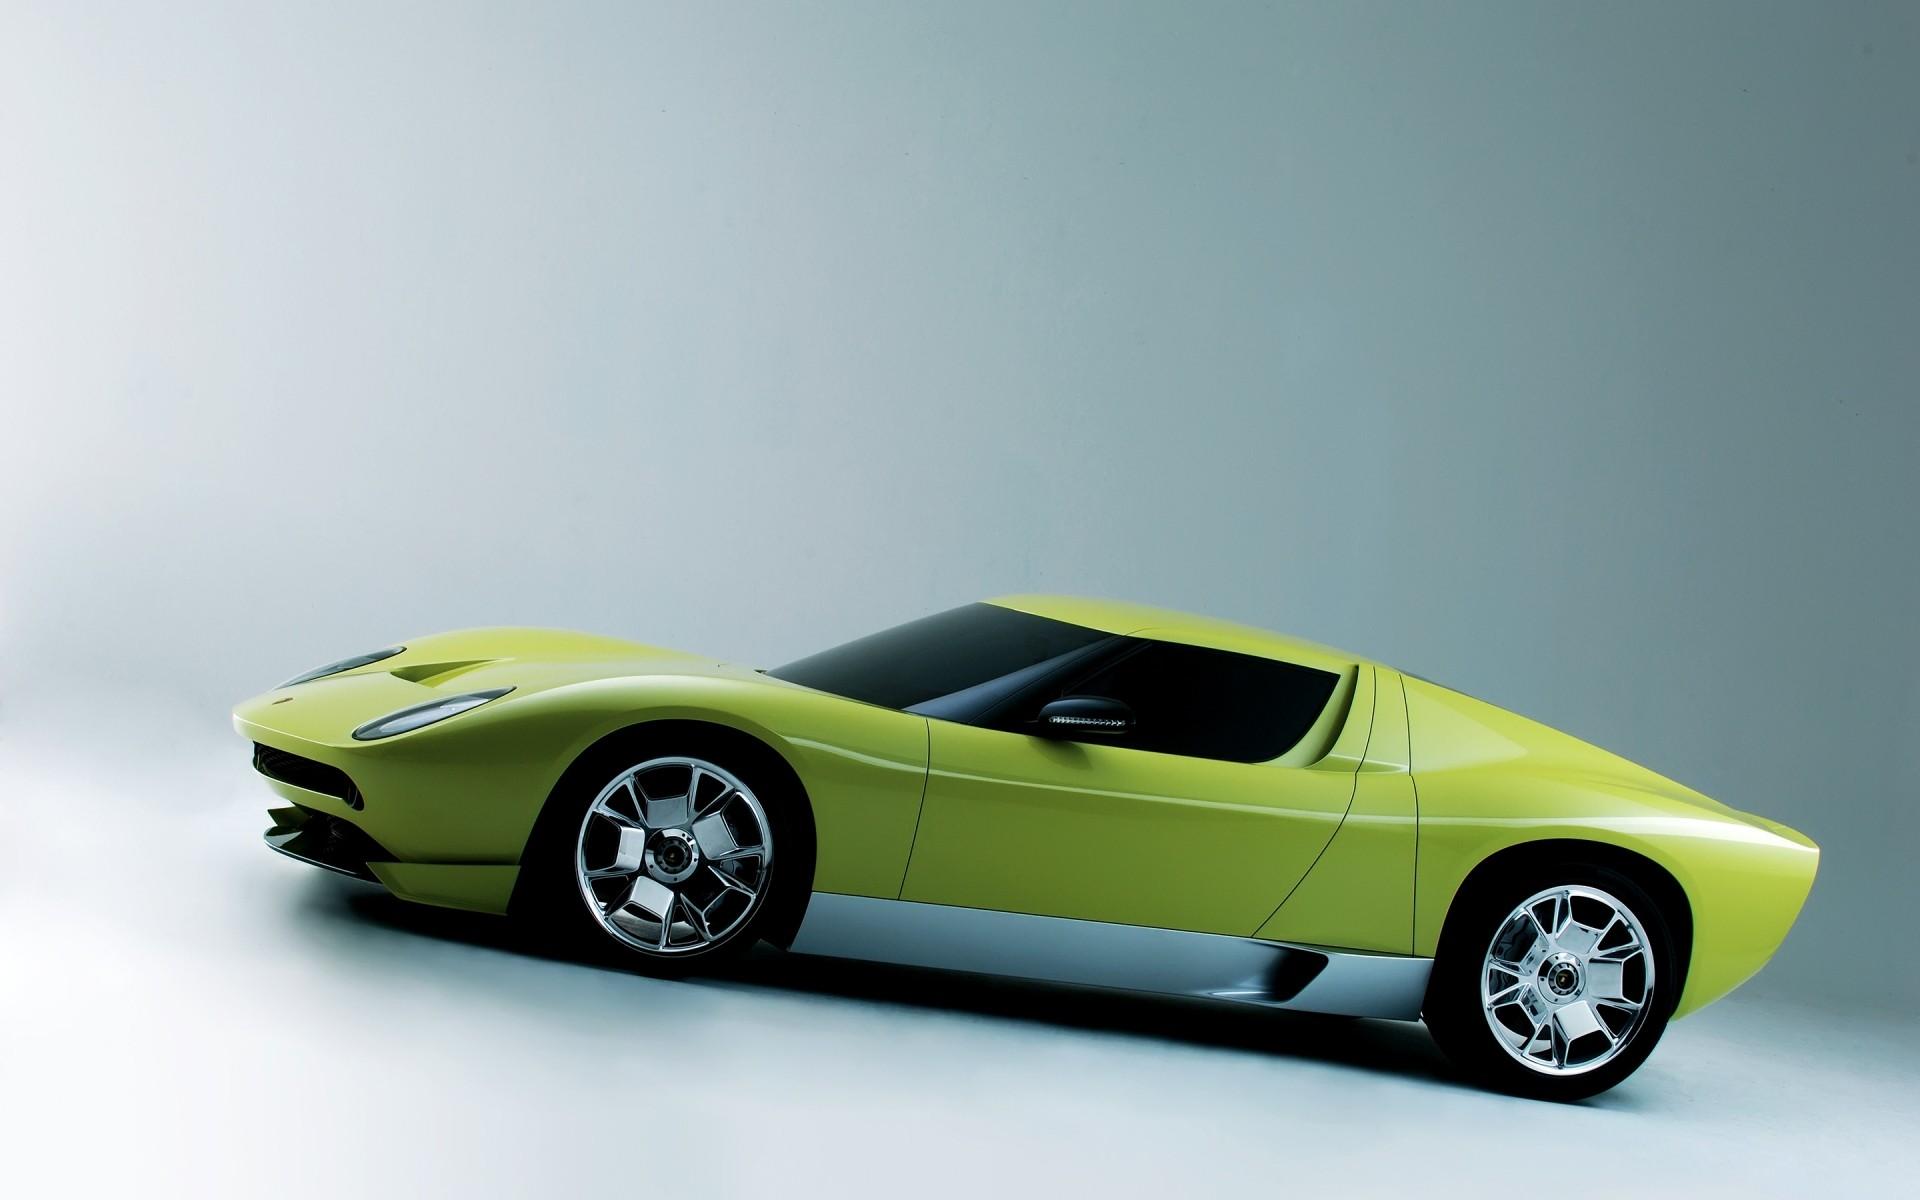 Lamborghini Miura Concept Side Iphone Wallpapers For Free